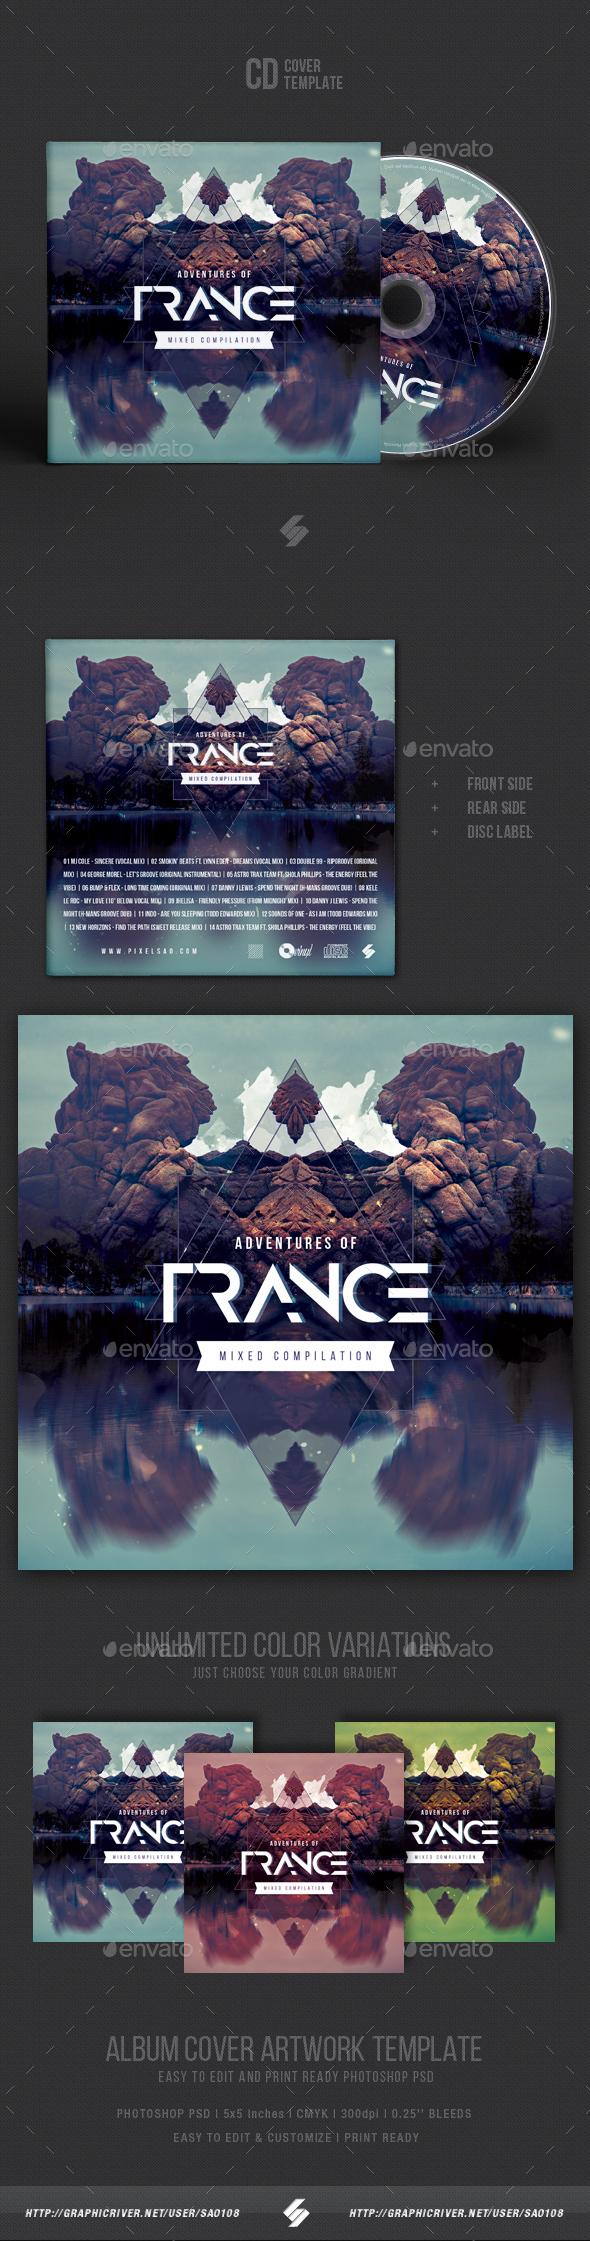 Adventures Of Trance - CD Cover Artwork Template - CD & DVD Artwork Print Templates